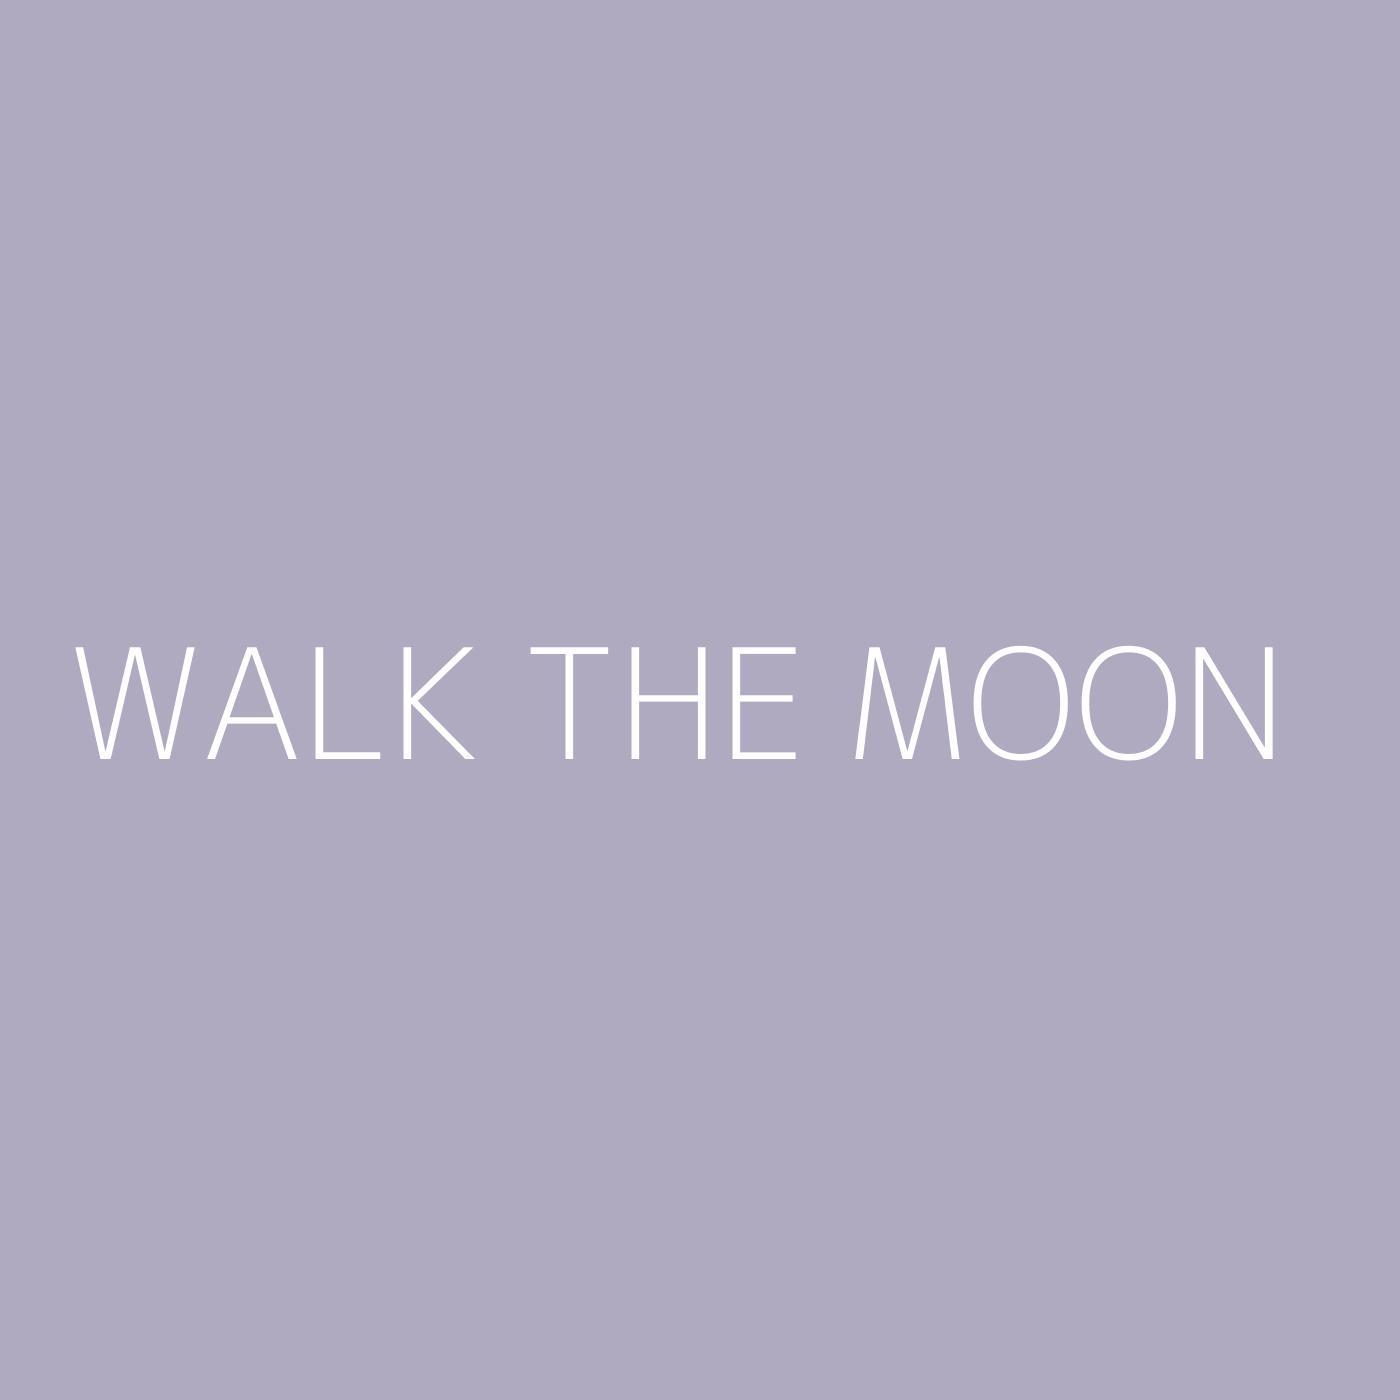 WALK THE MOON Playlist Artwork